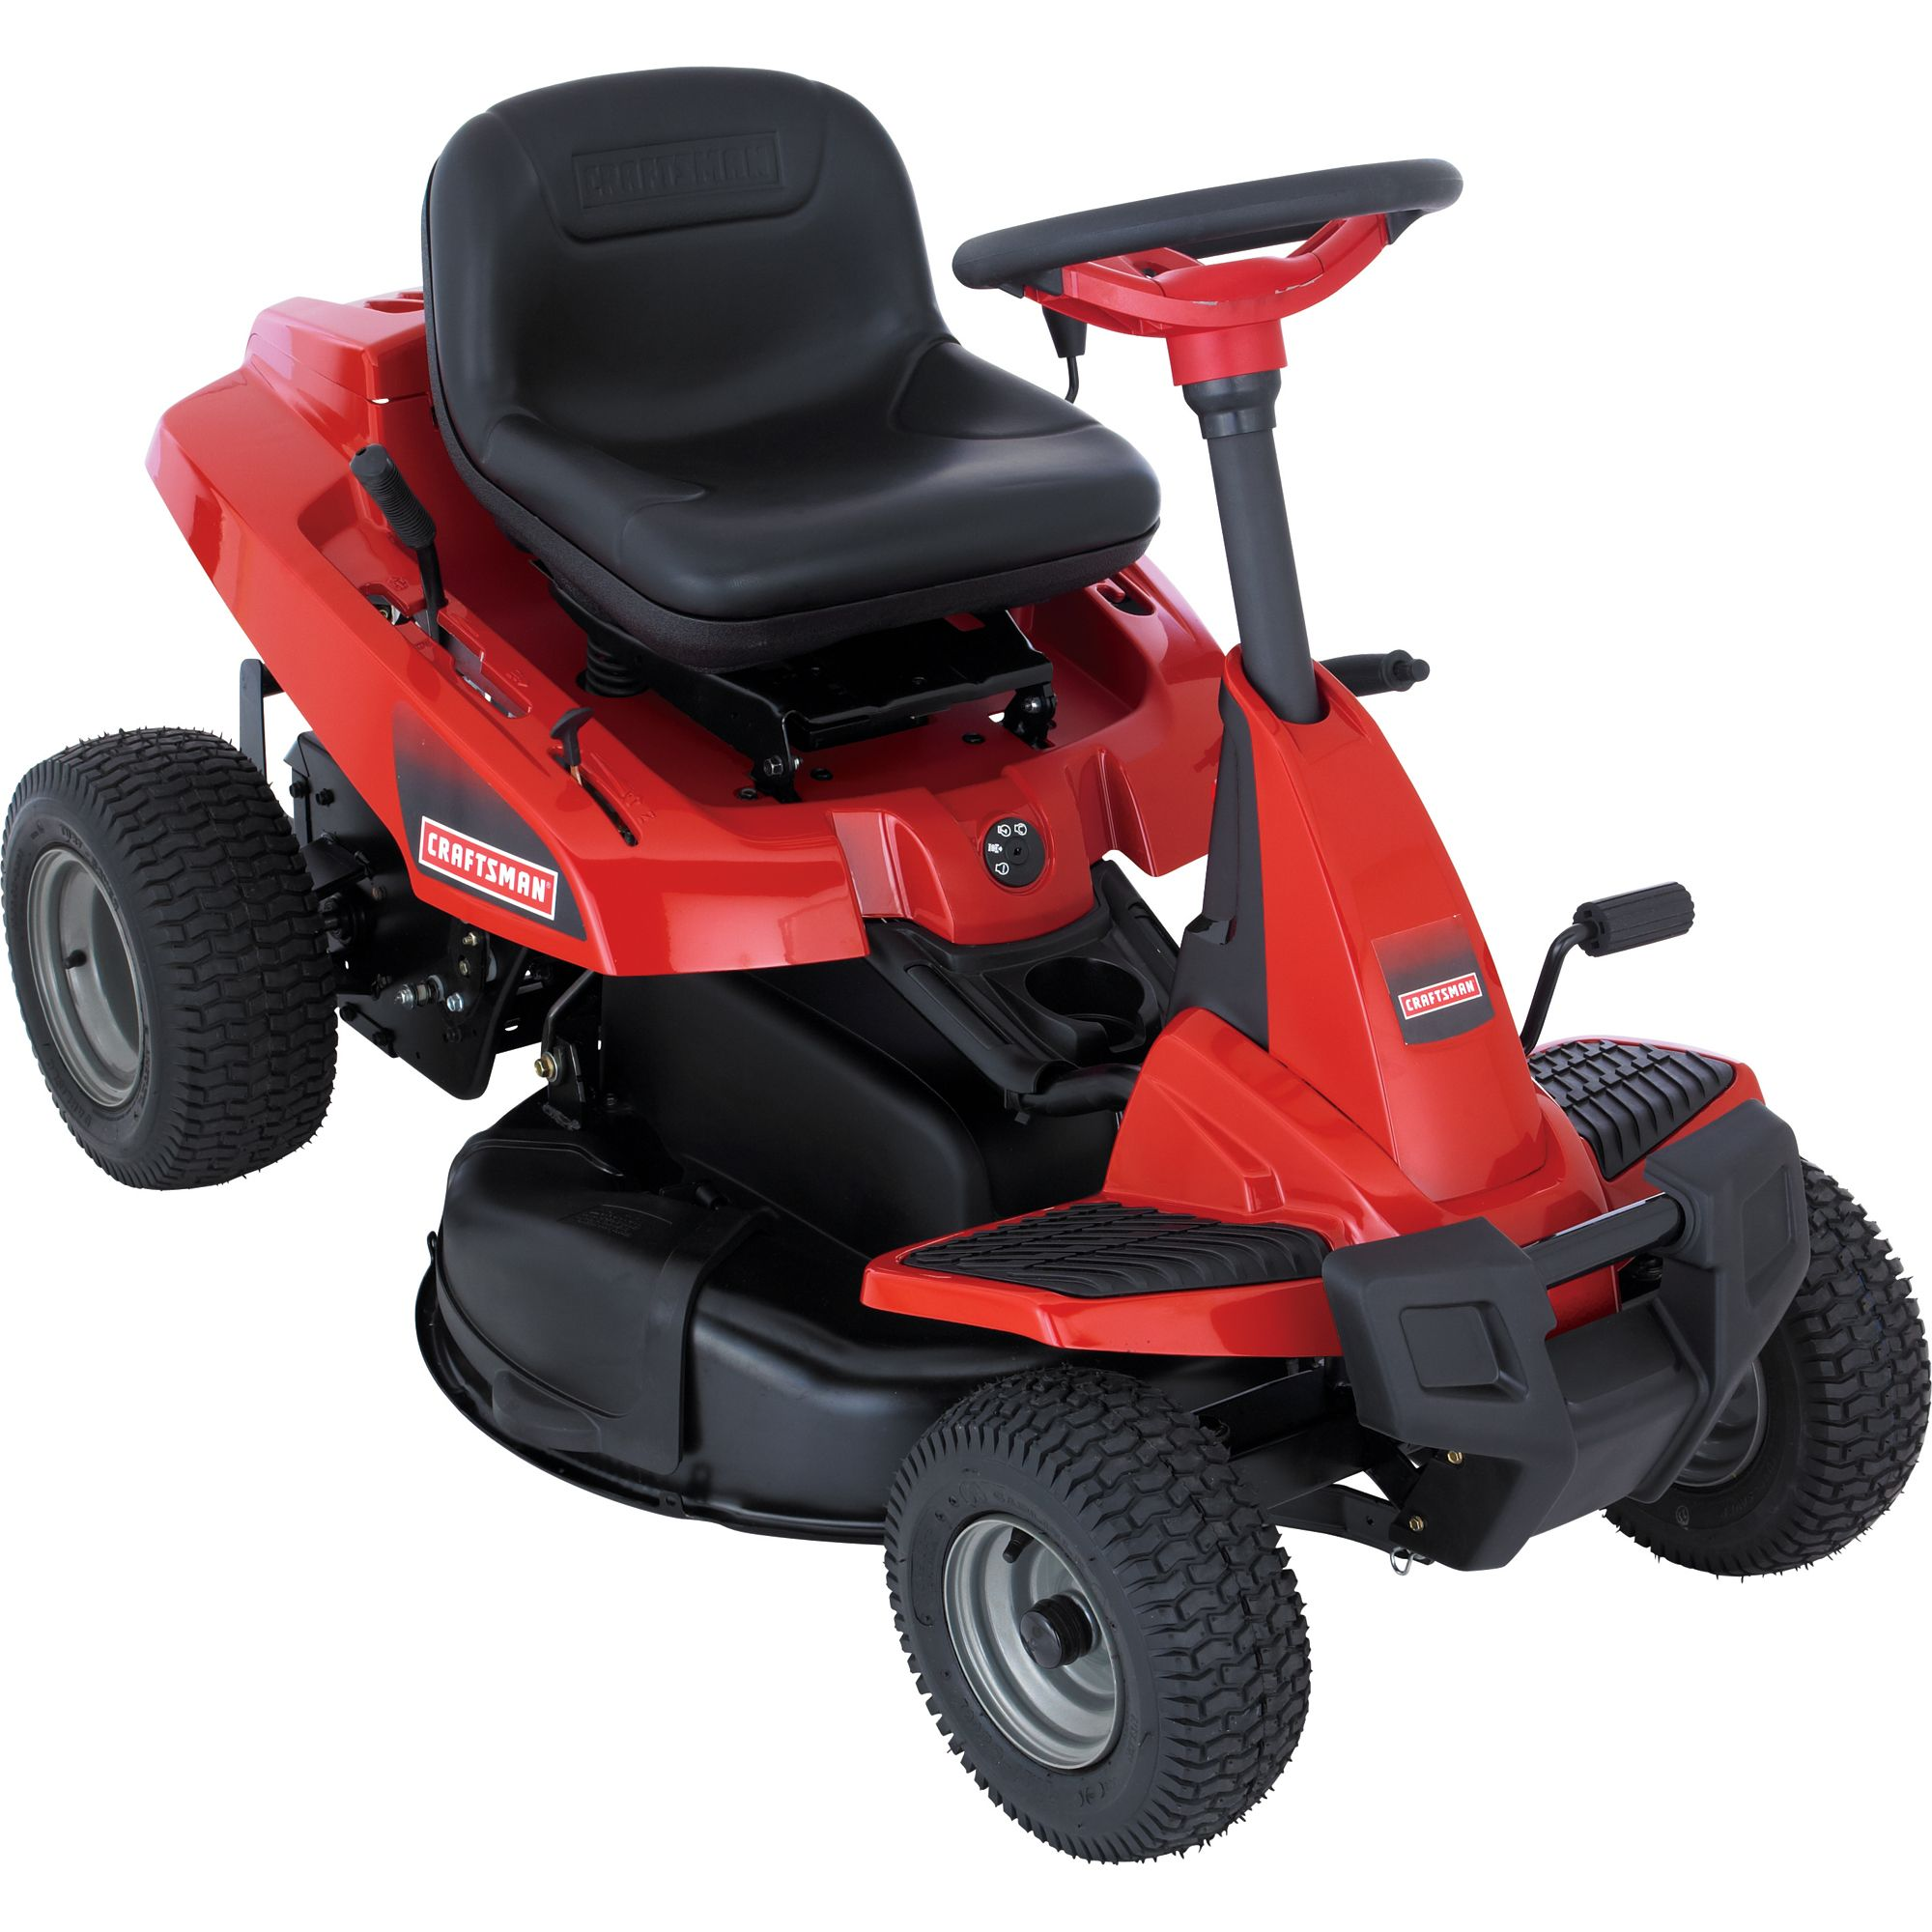 Craftsman model 917280010 lawn, riding mower rear engine genuine parts